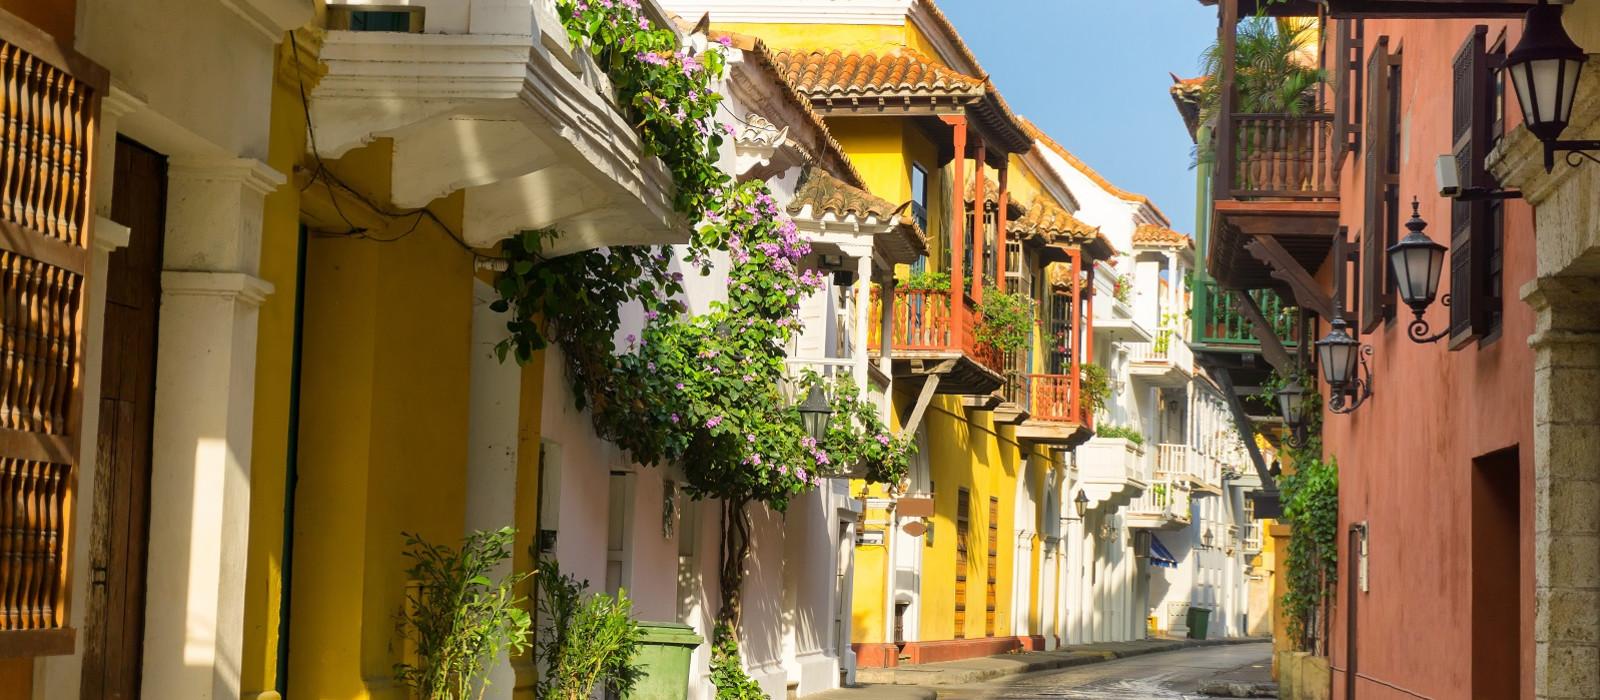 Kulturelles Ecuador und bezauberndes Kolumbien Urlaub 1